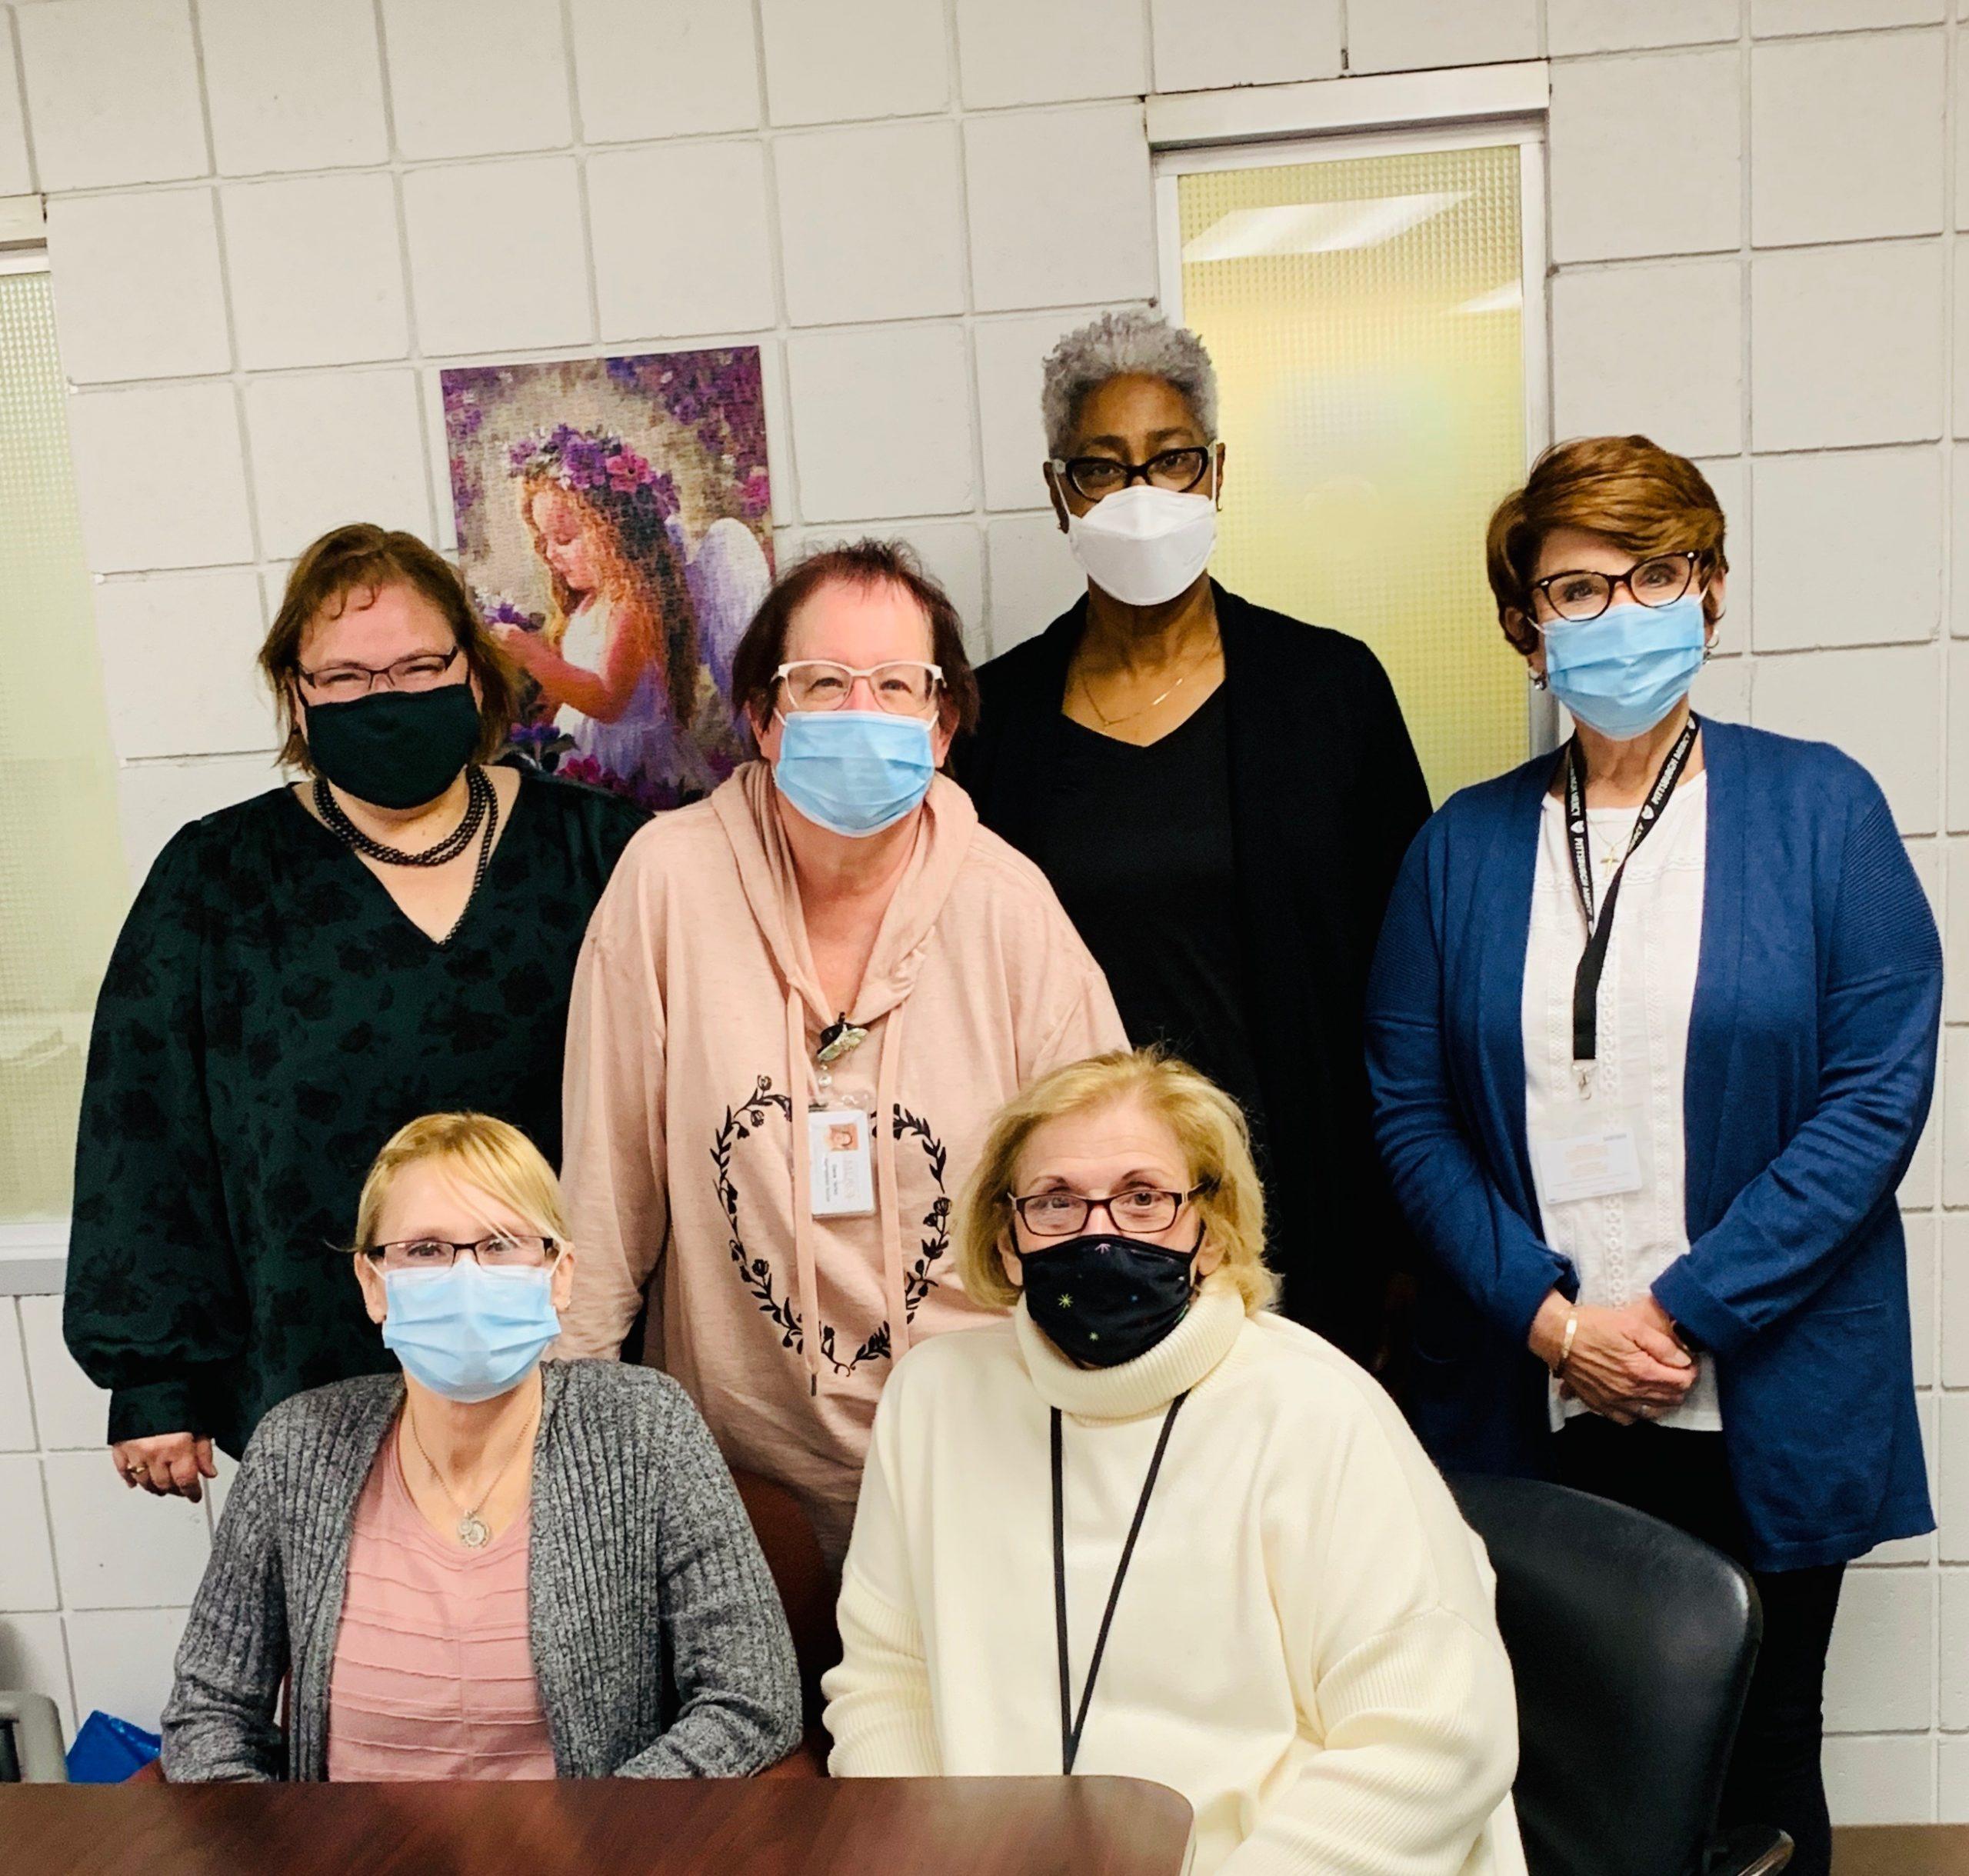 Six women posed, wearing COVID-19 face masks